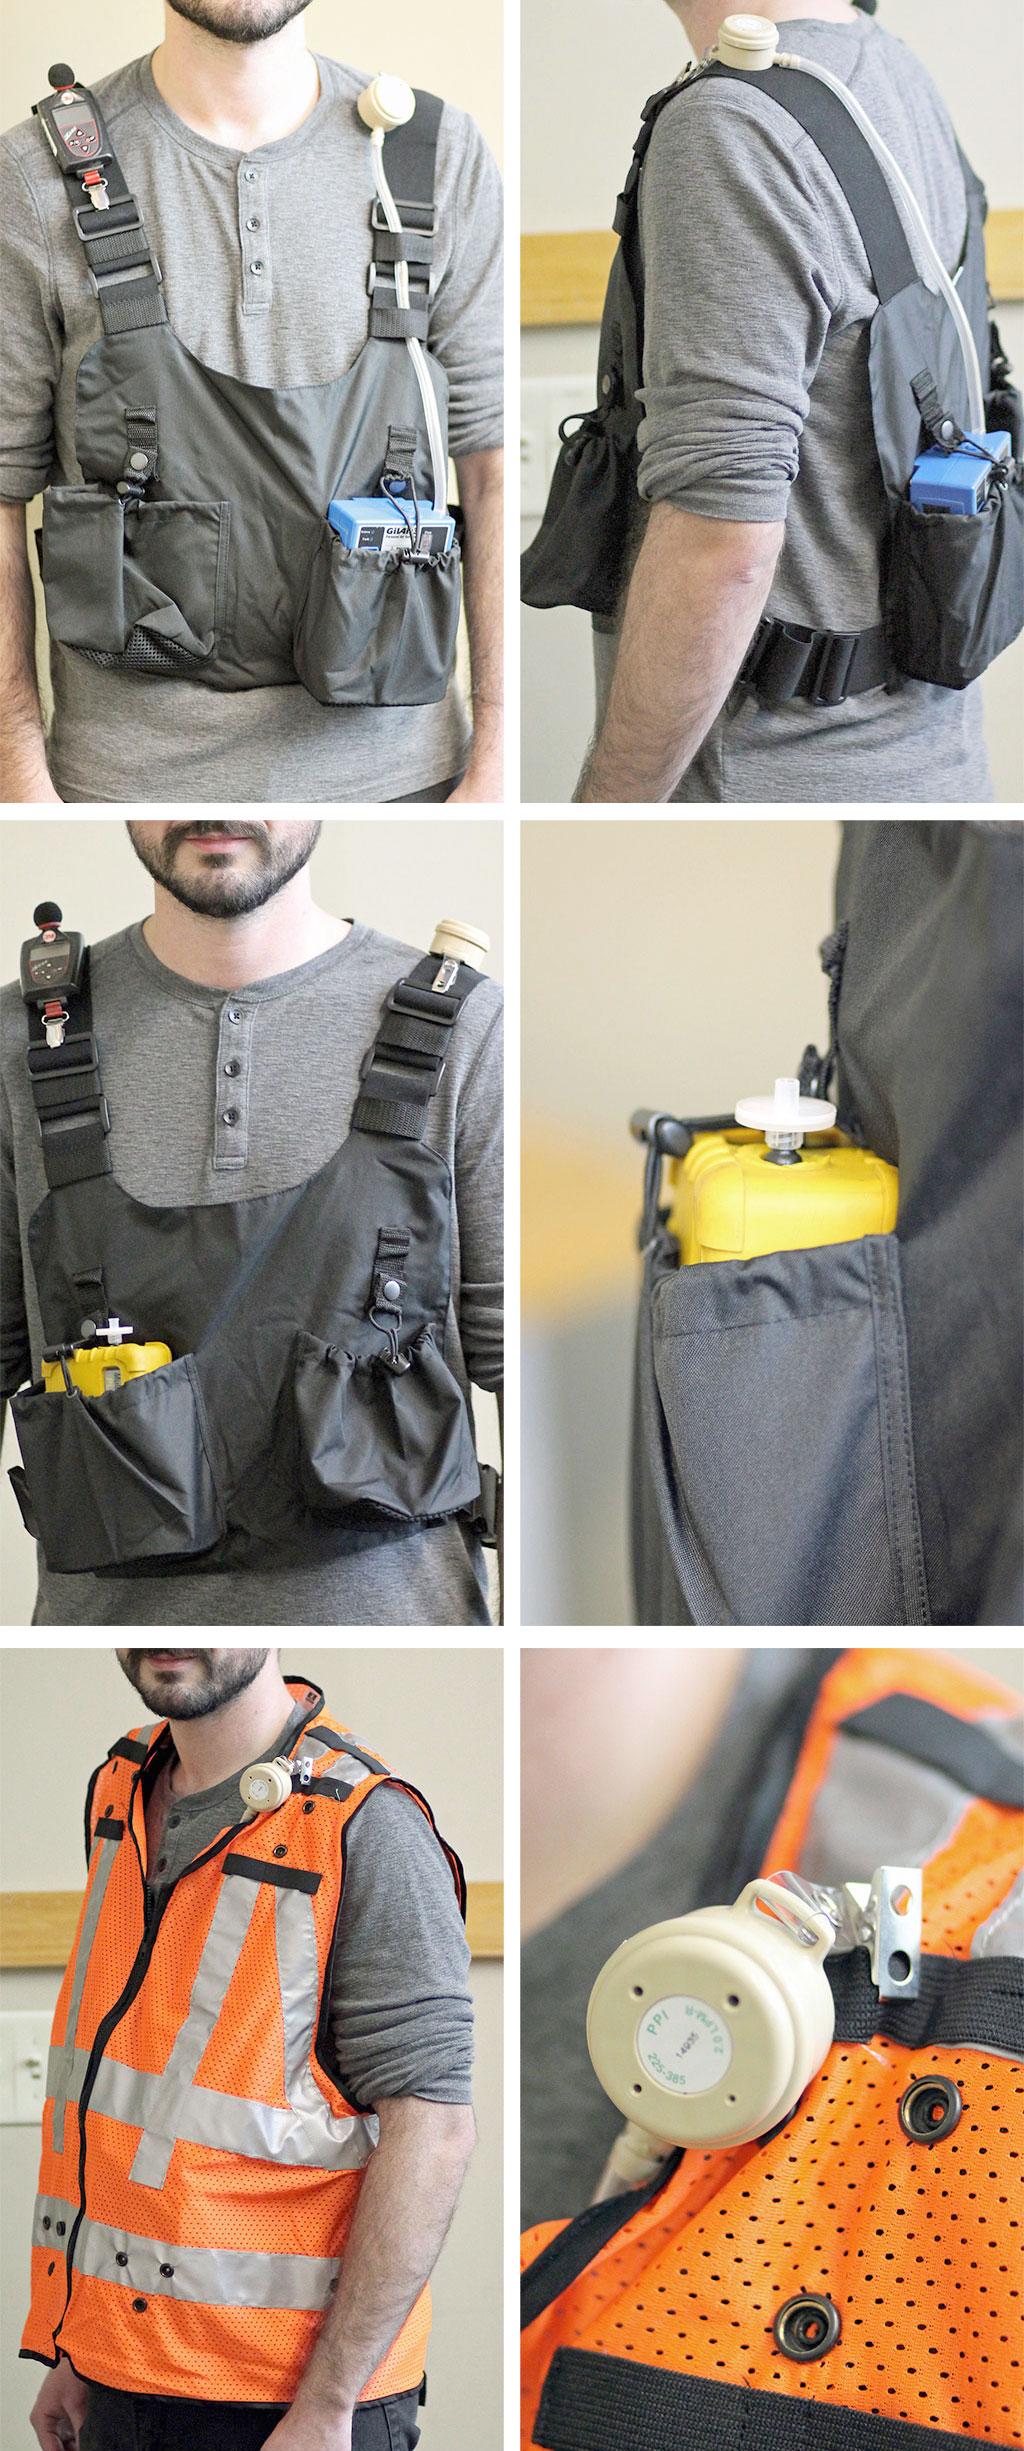 SGS Galson Personal Exposure Vest